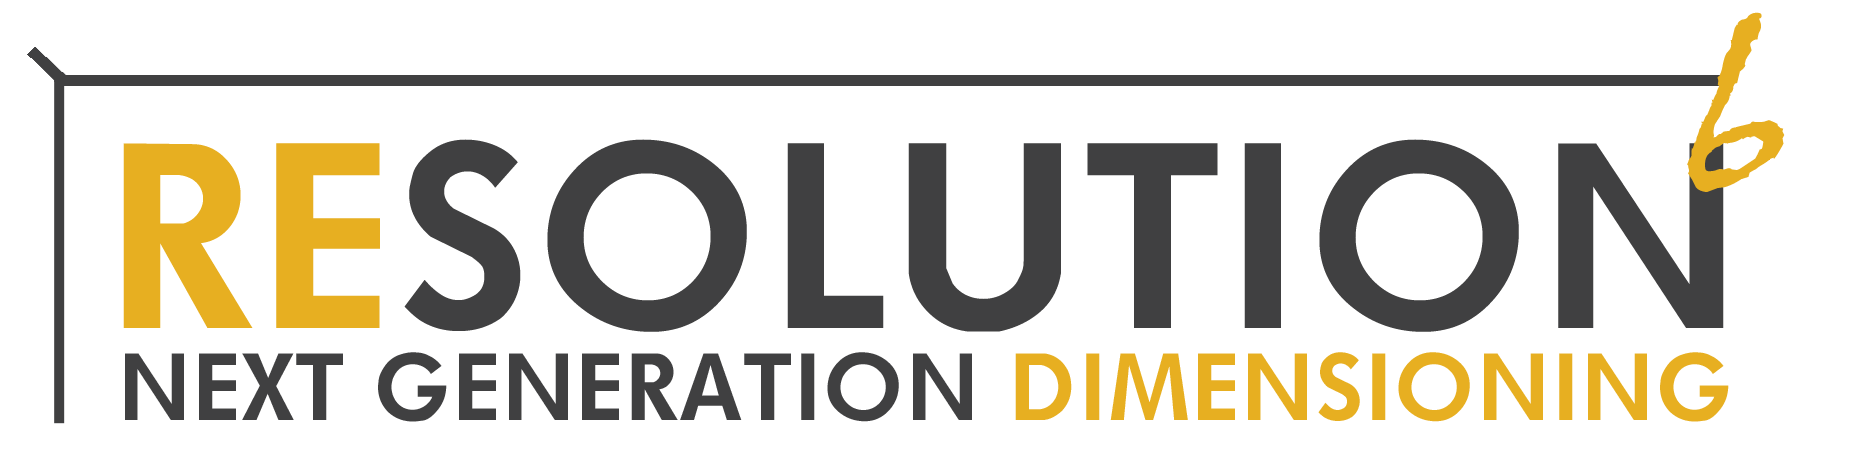 Resolution 6 Dimensioner Logo